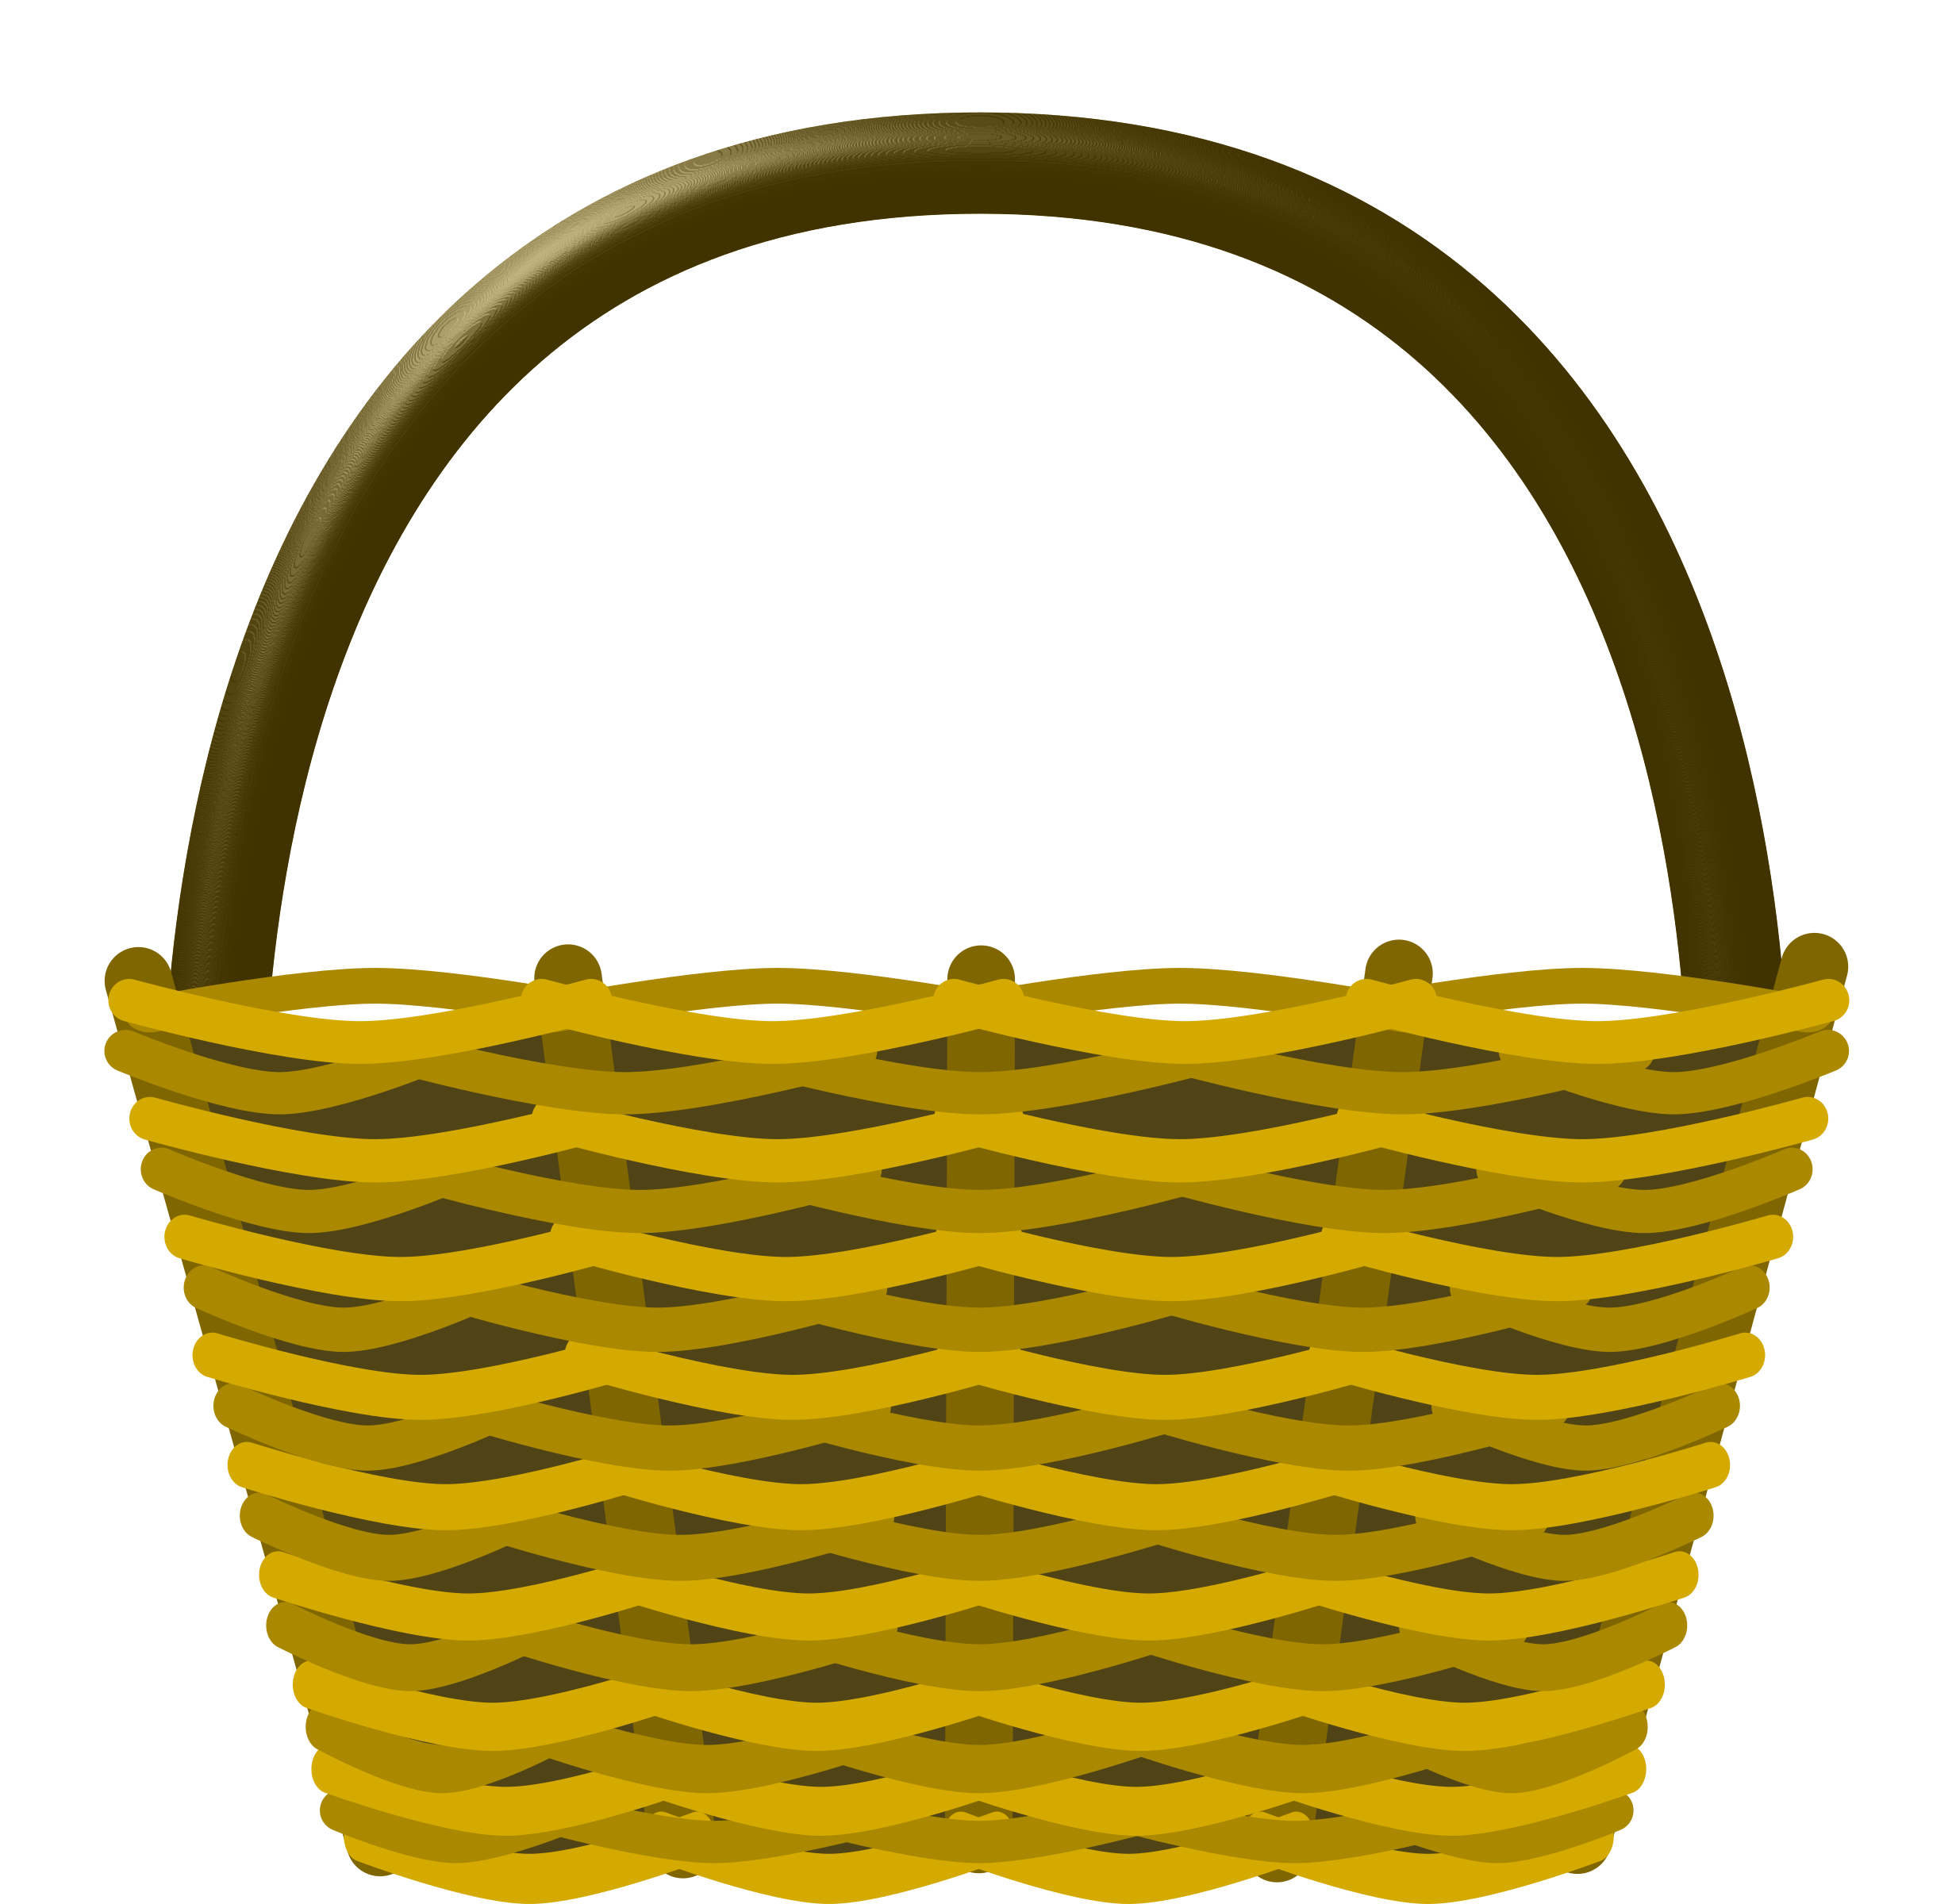 2460x2400 Basket Clip Art Many Interesting Cliparts